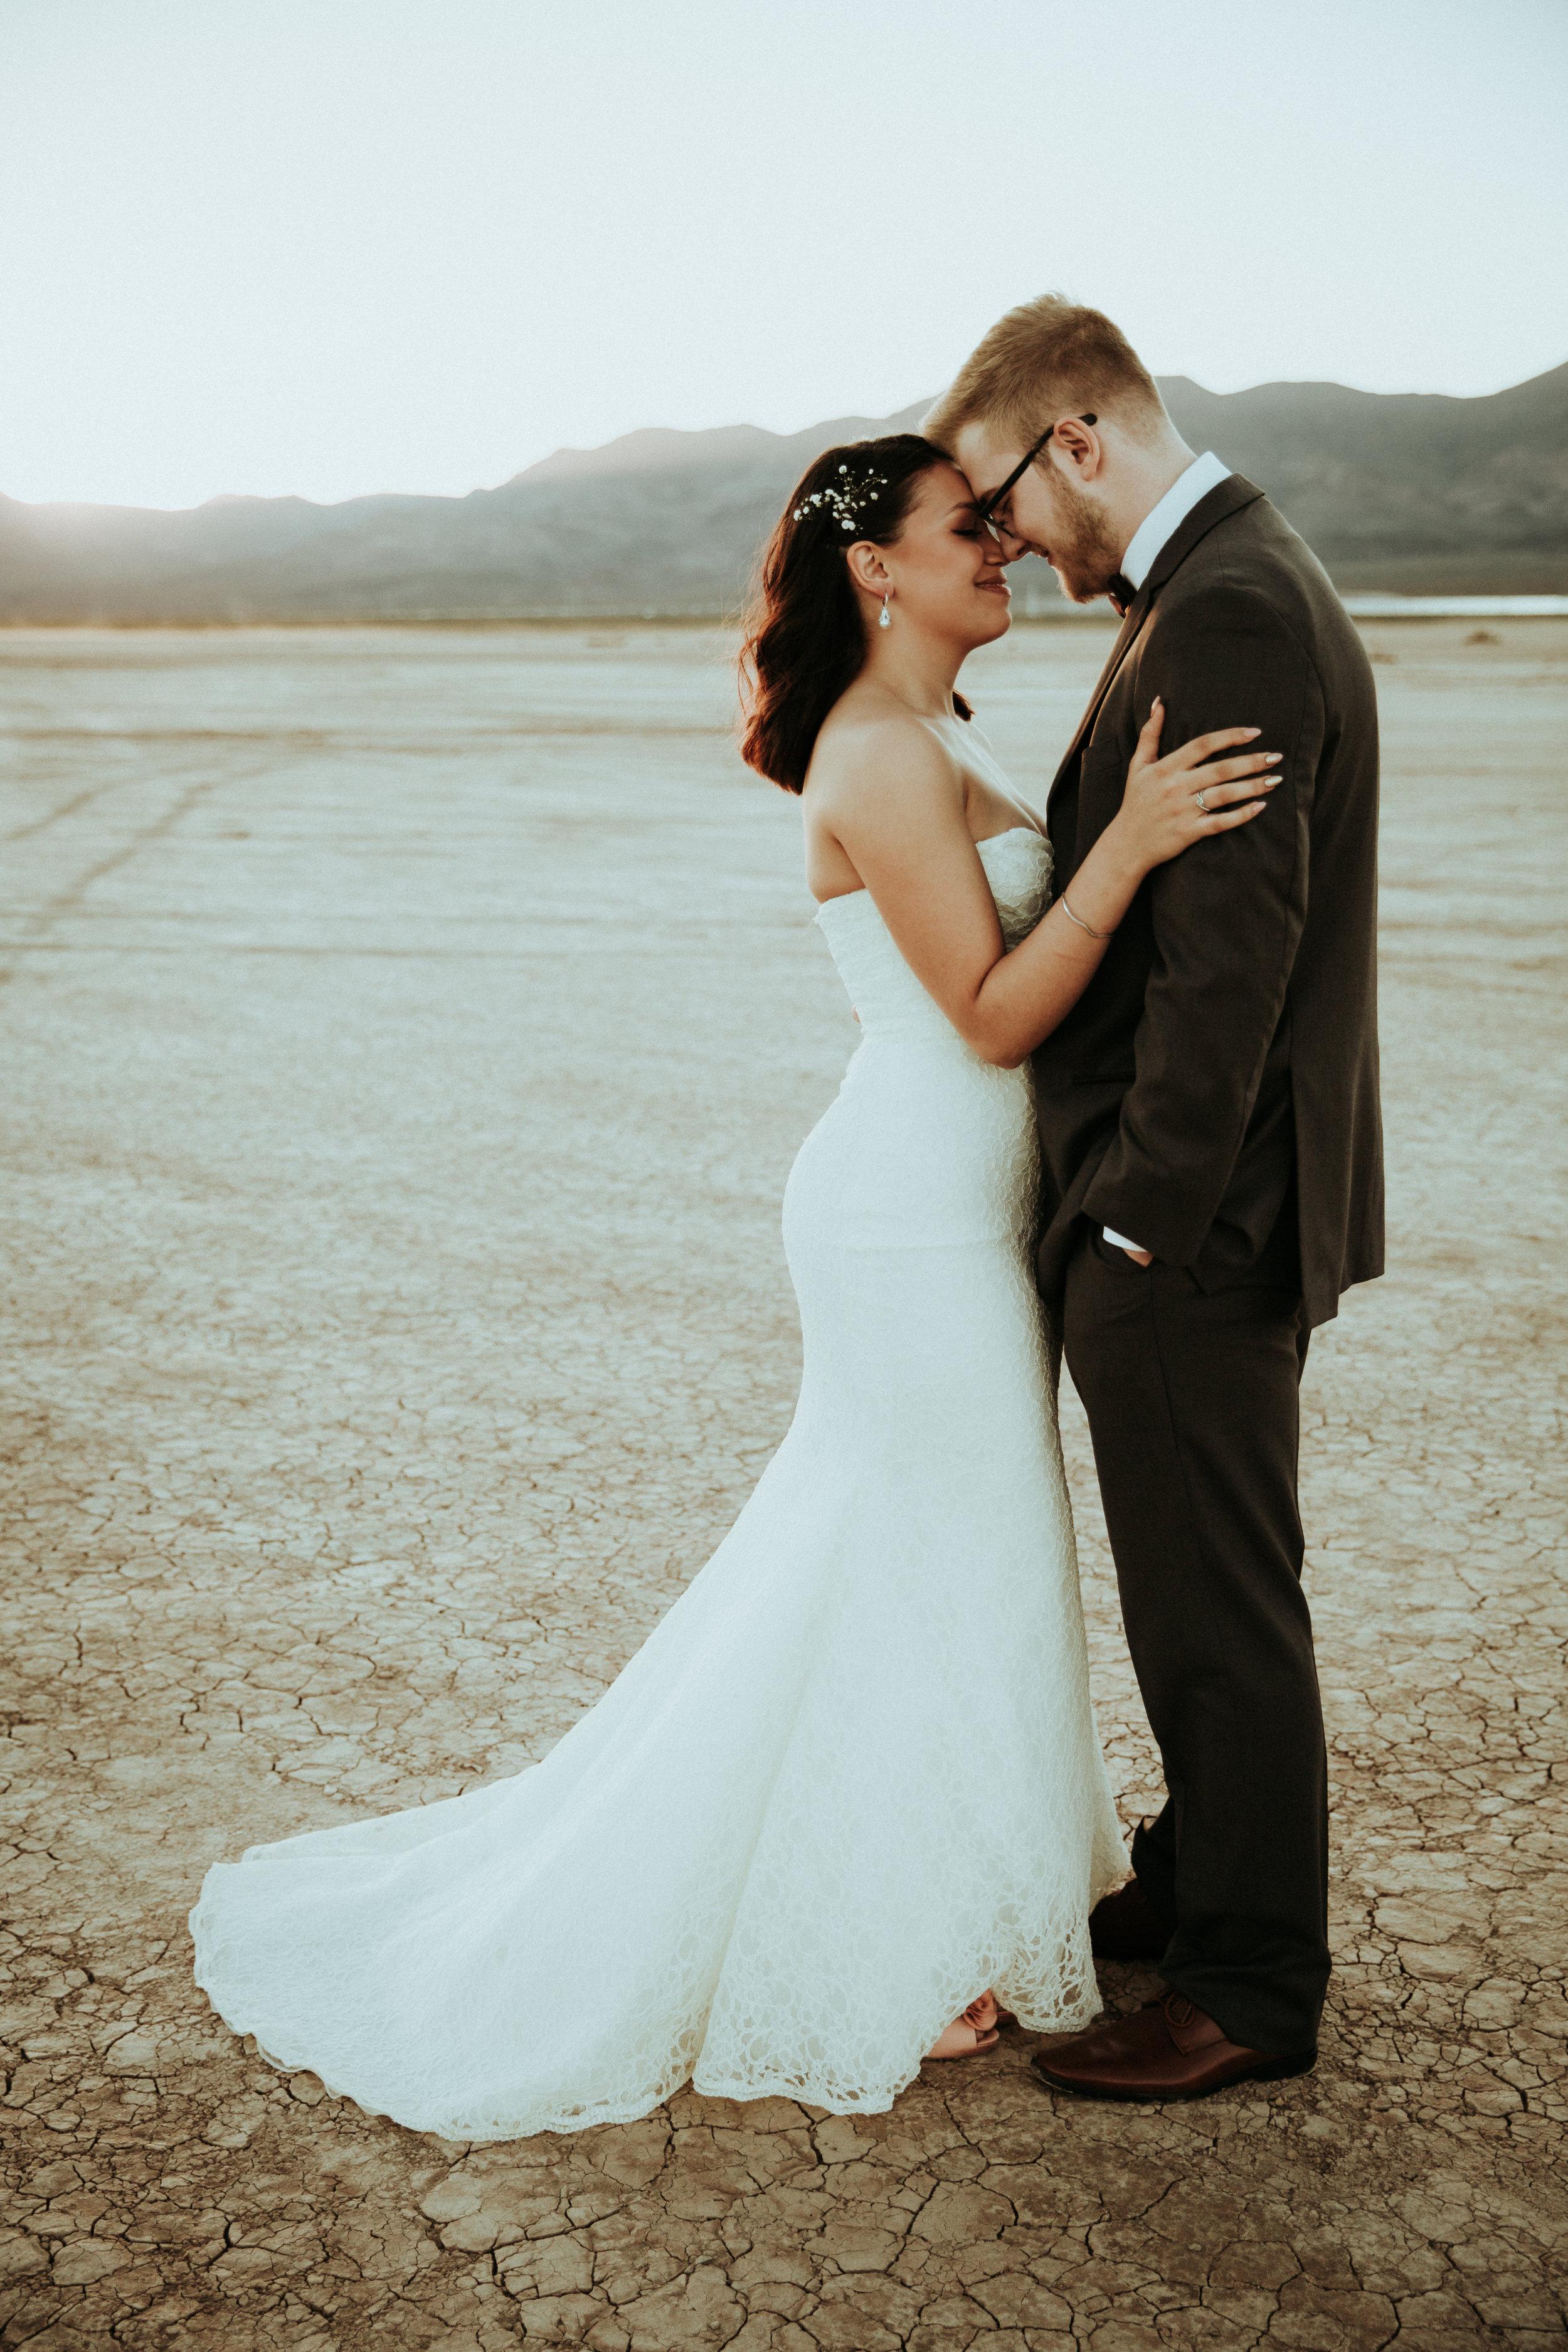 Las Vegas Wedding Photographer - Henderson, NV